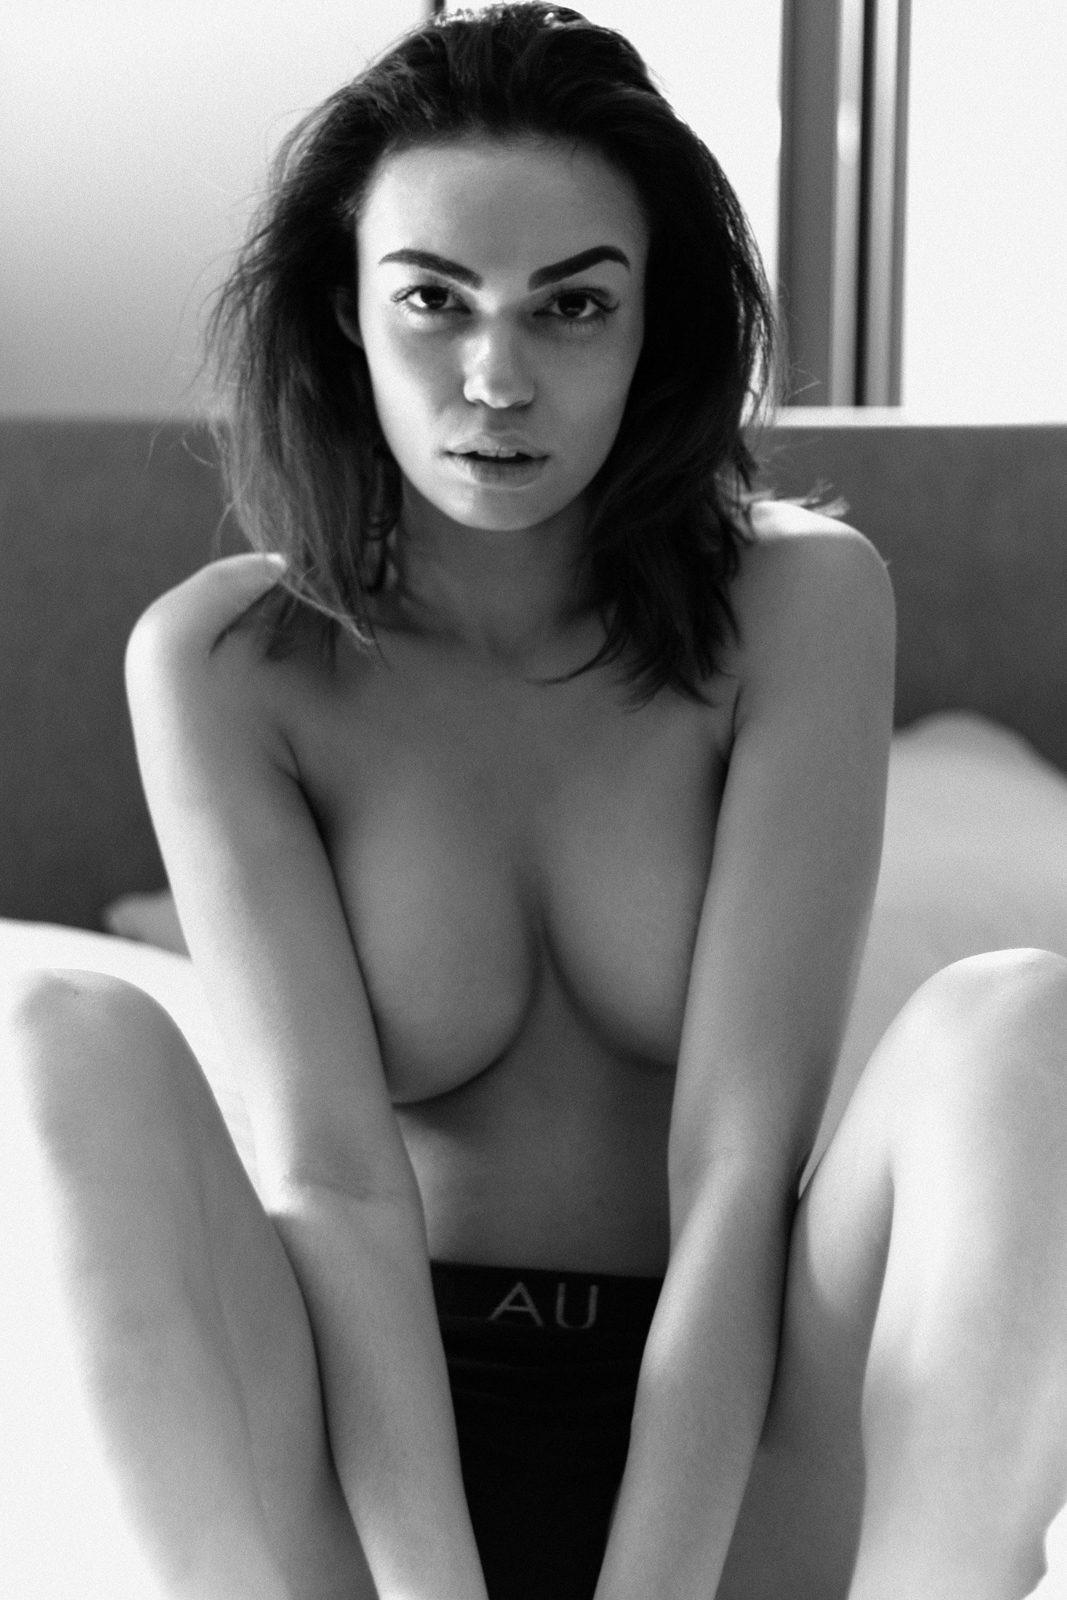 The Morning Before The Flight Women  Masonwabe Mesatywa   // lionsmag.com - premium nude photography magazine